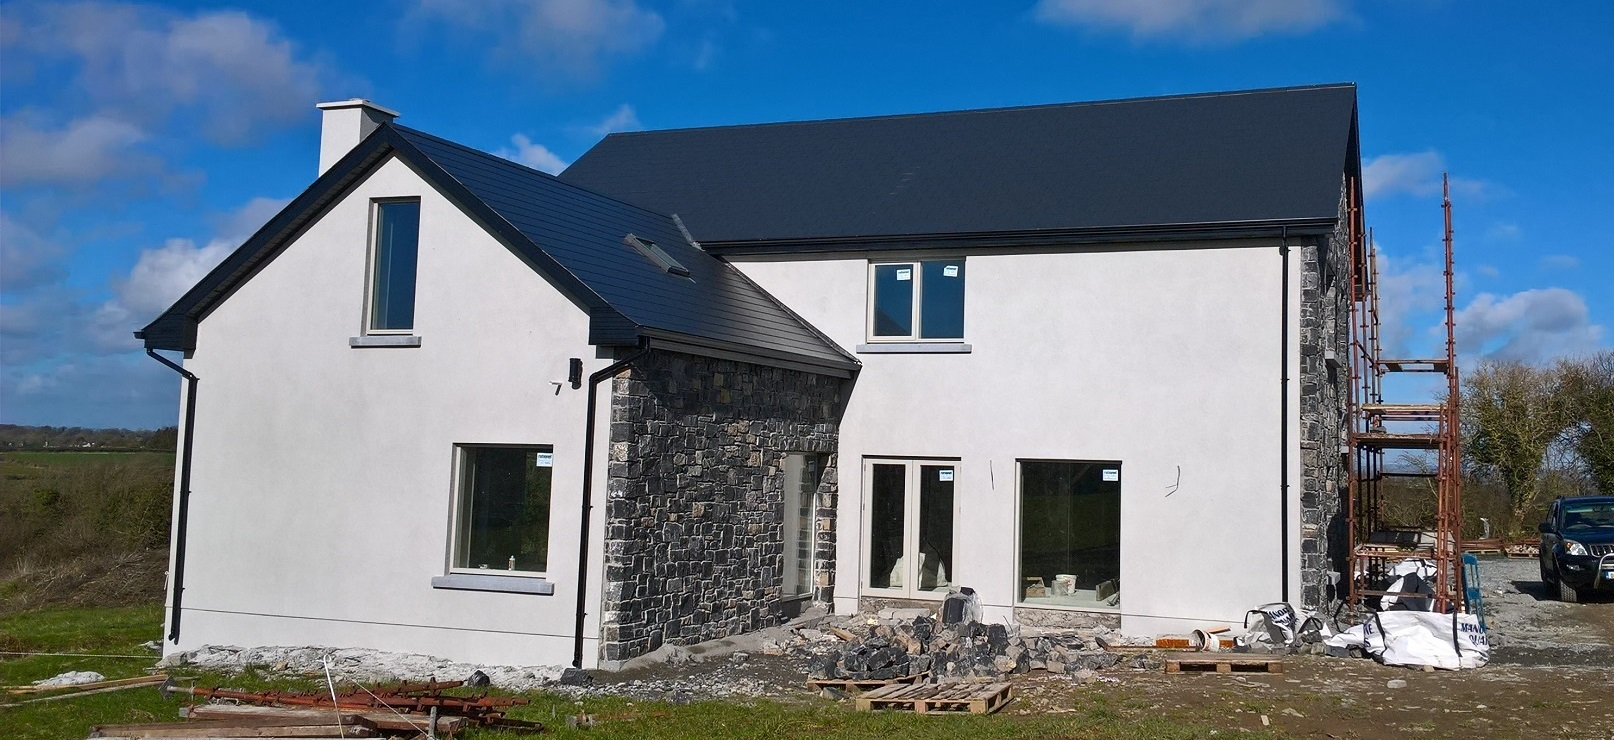 John Hoyne Plastering Contractor, Kilkenny, Carlow, Kildare, Wicklow